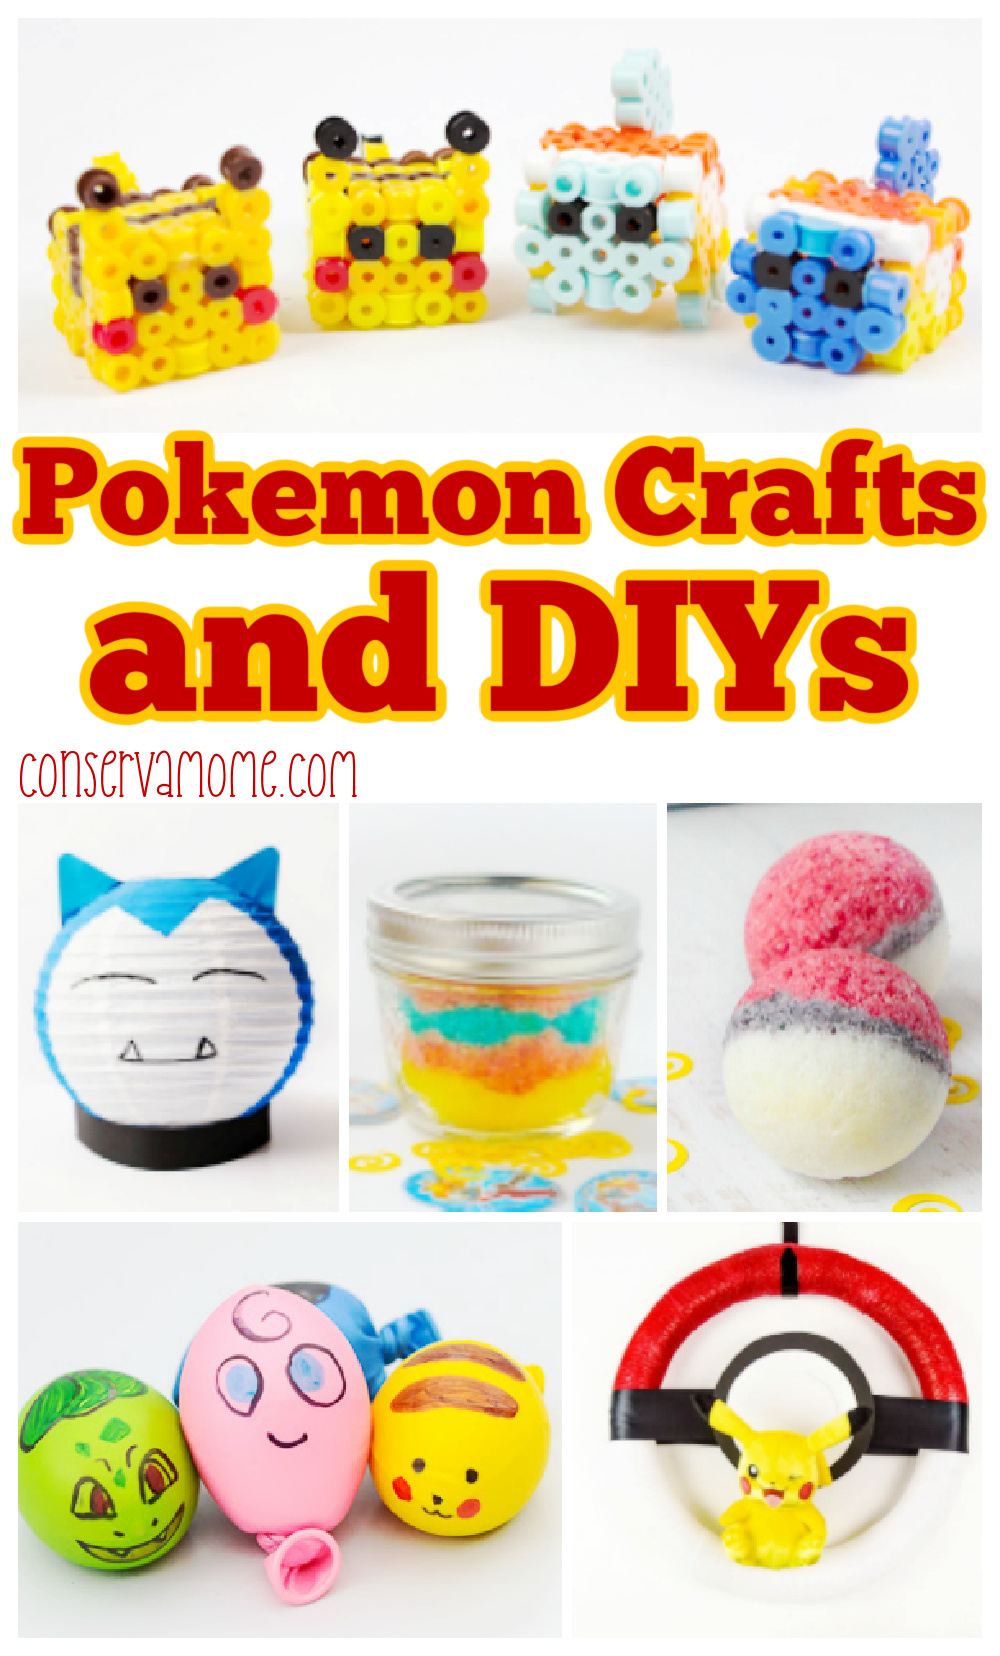 Pokemon crafts and diys